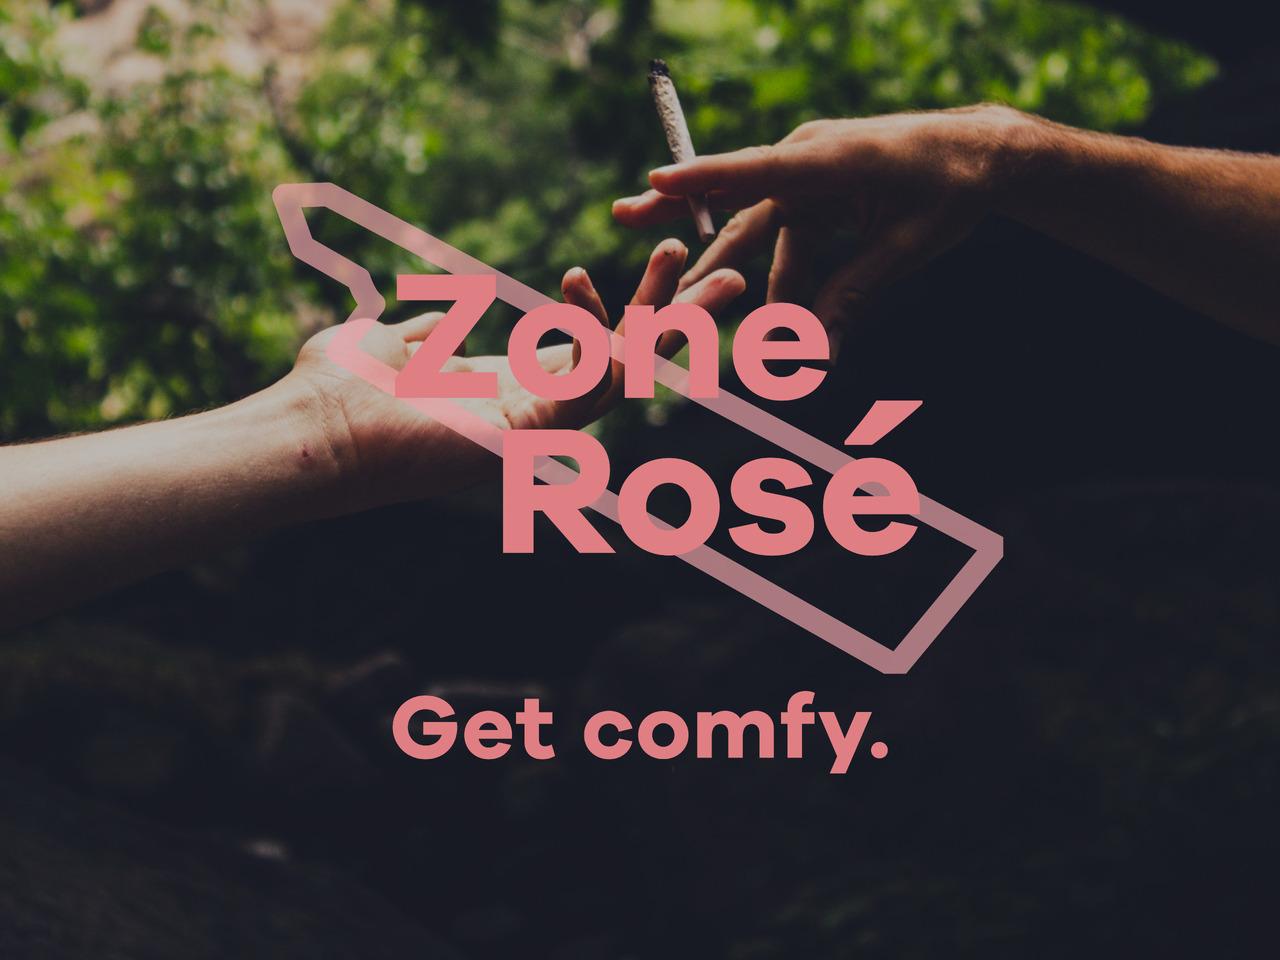 Zone Rosé – Get comfy.